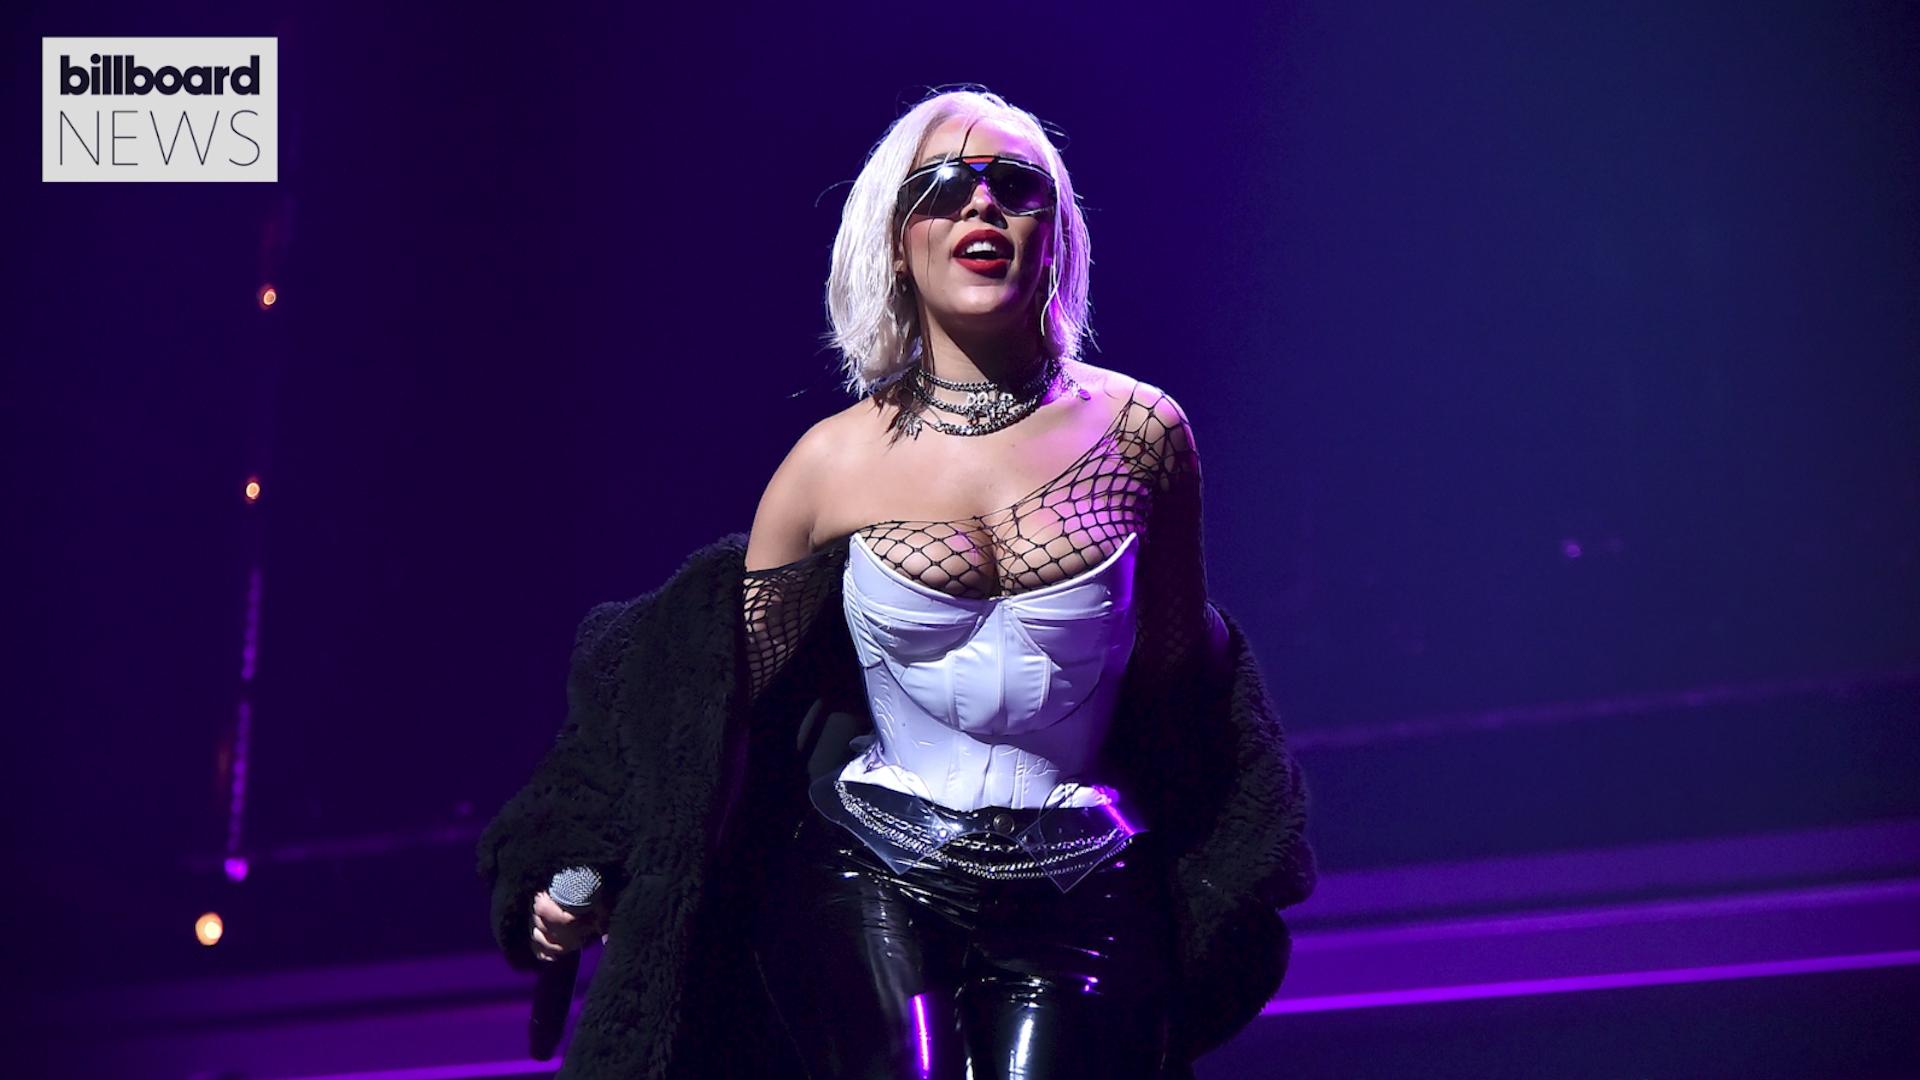 Doja Cat Ropes in Eve For Slinky 'Planet Her' Bonus Track 'Tonight'